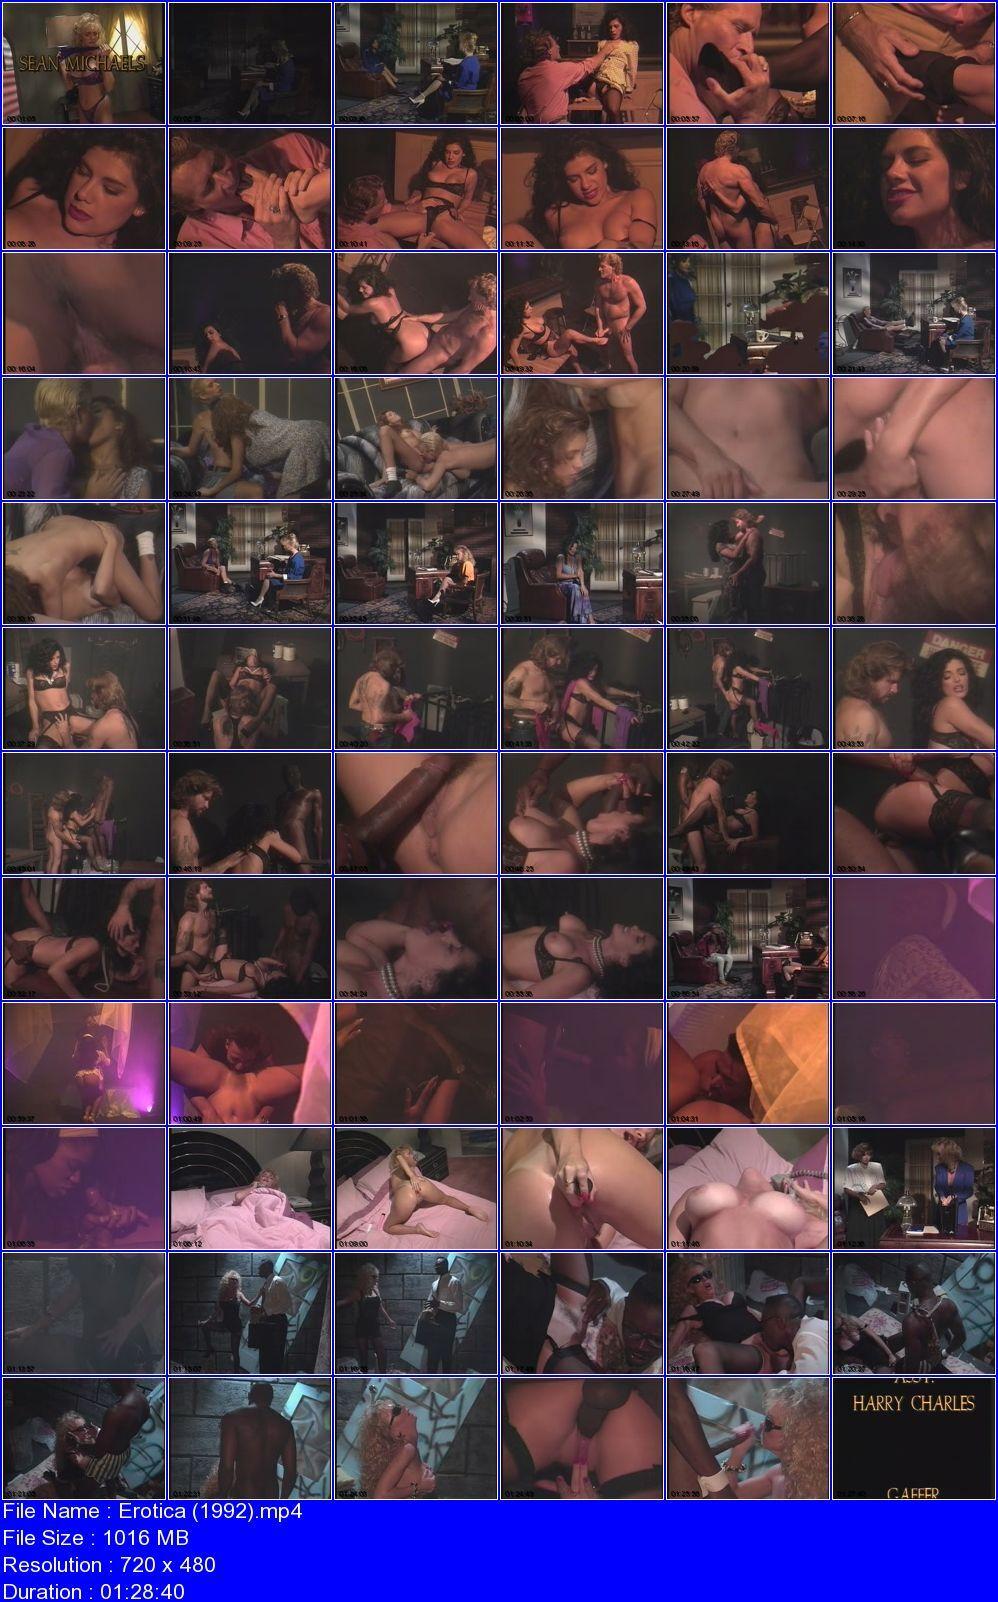 Erotica (1992).mp4.jpg